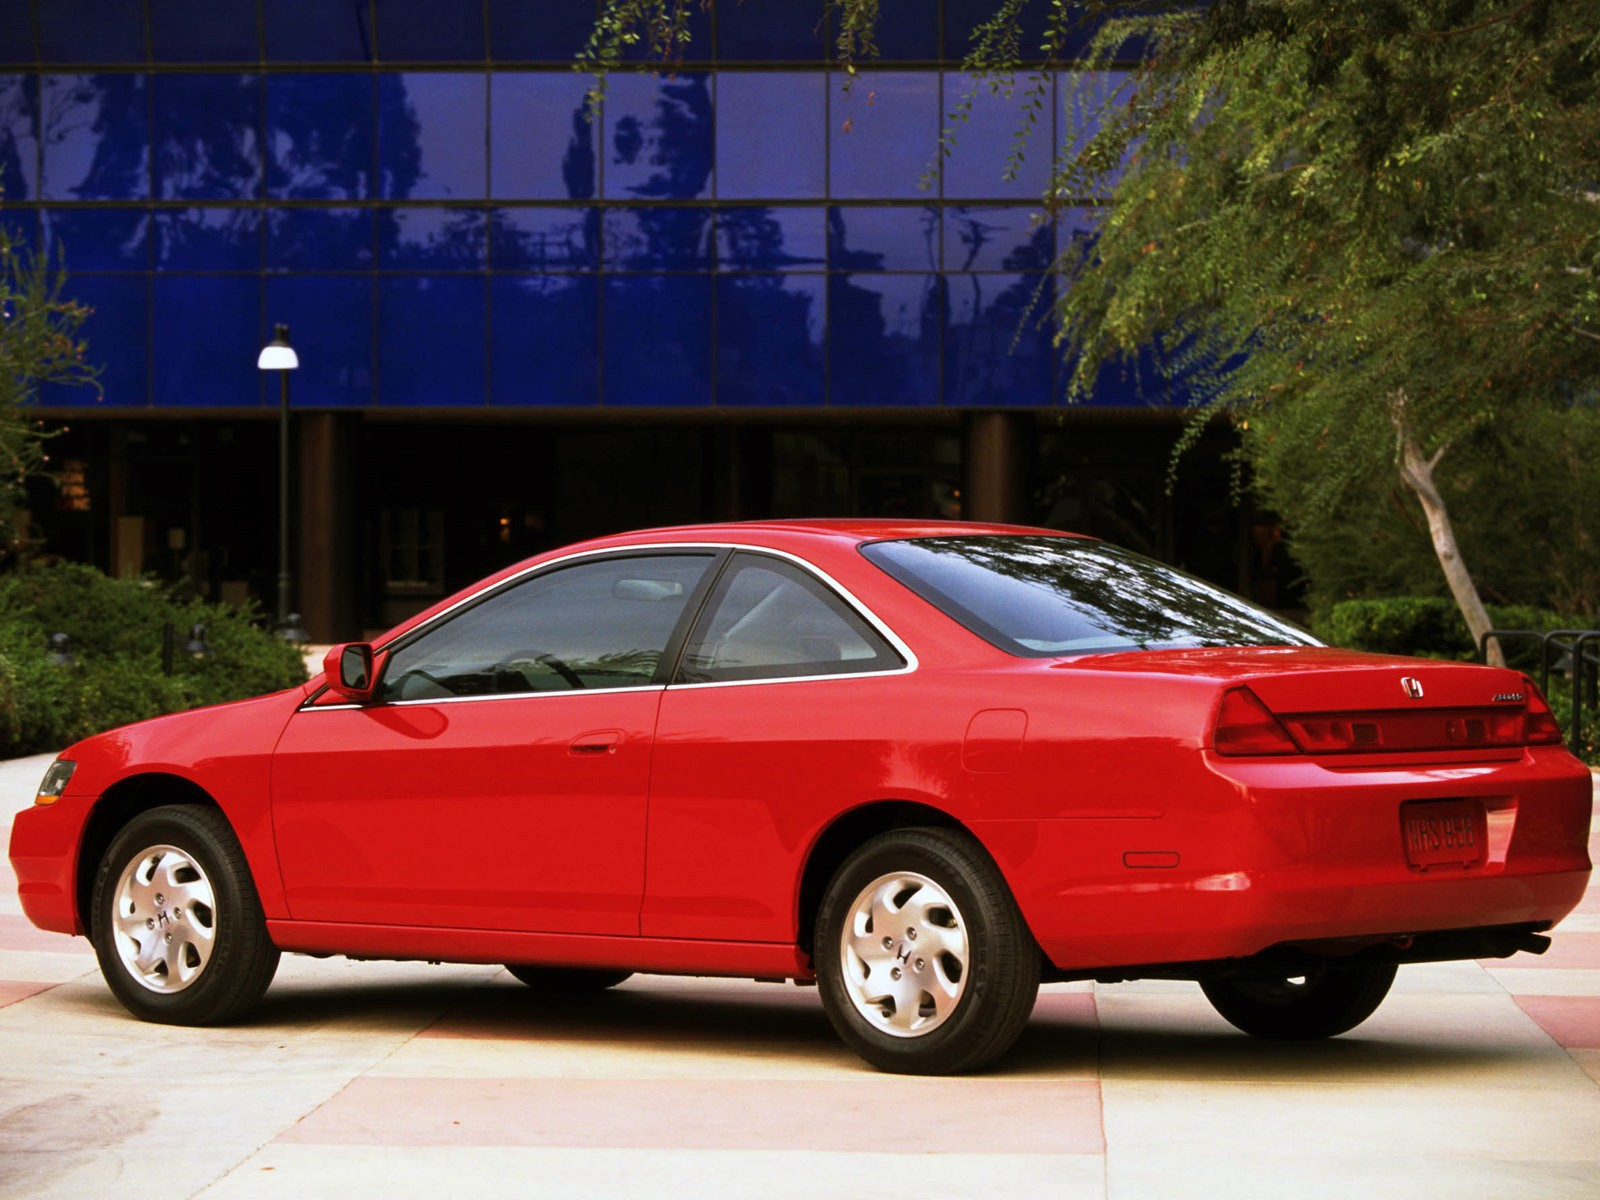 1998 Honda Accord Reviews >> HONDA Accord Coupe - 1998, 1999, 2000, 2001, 2002 - autoevolution